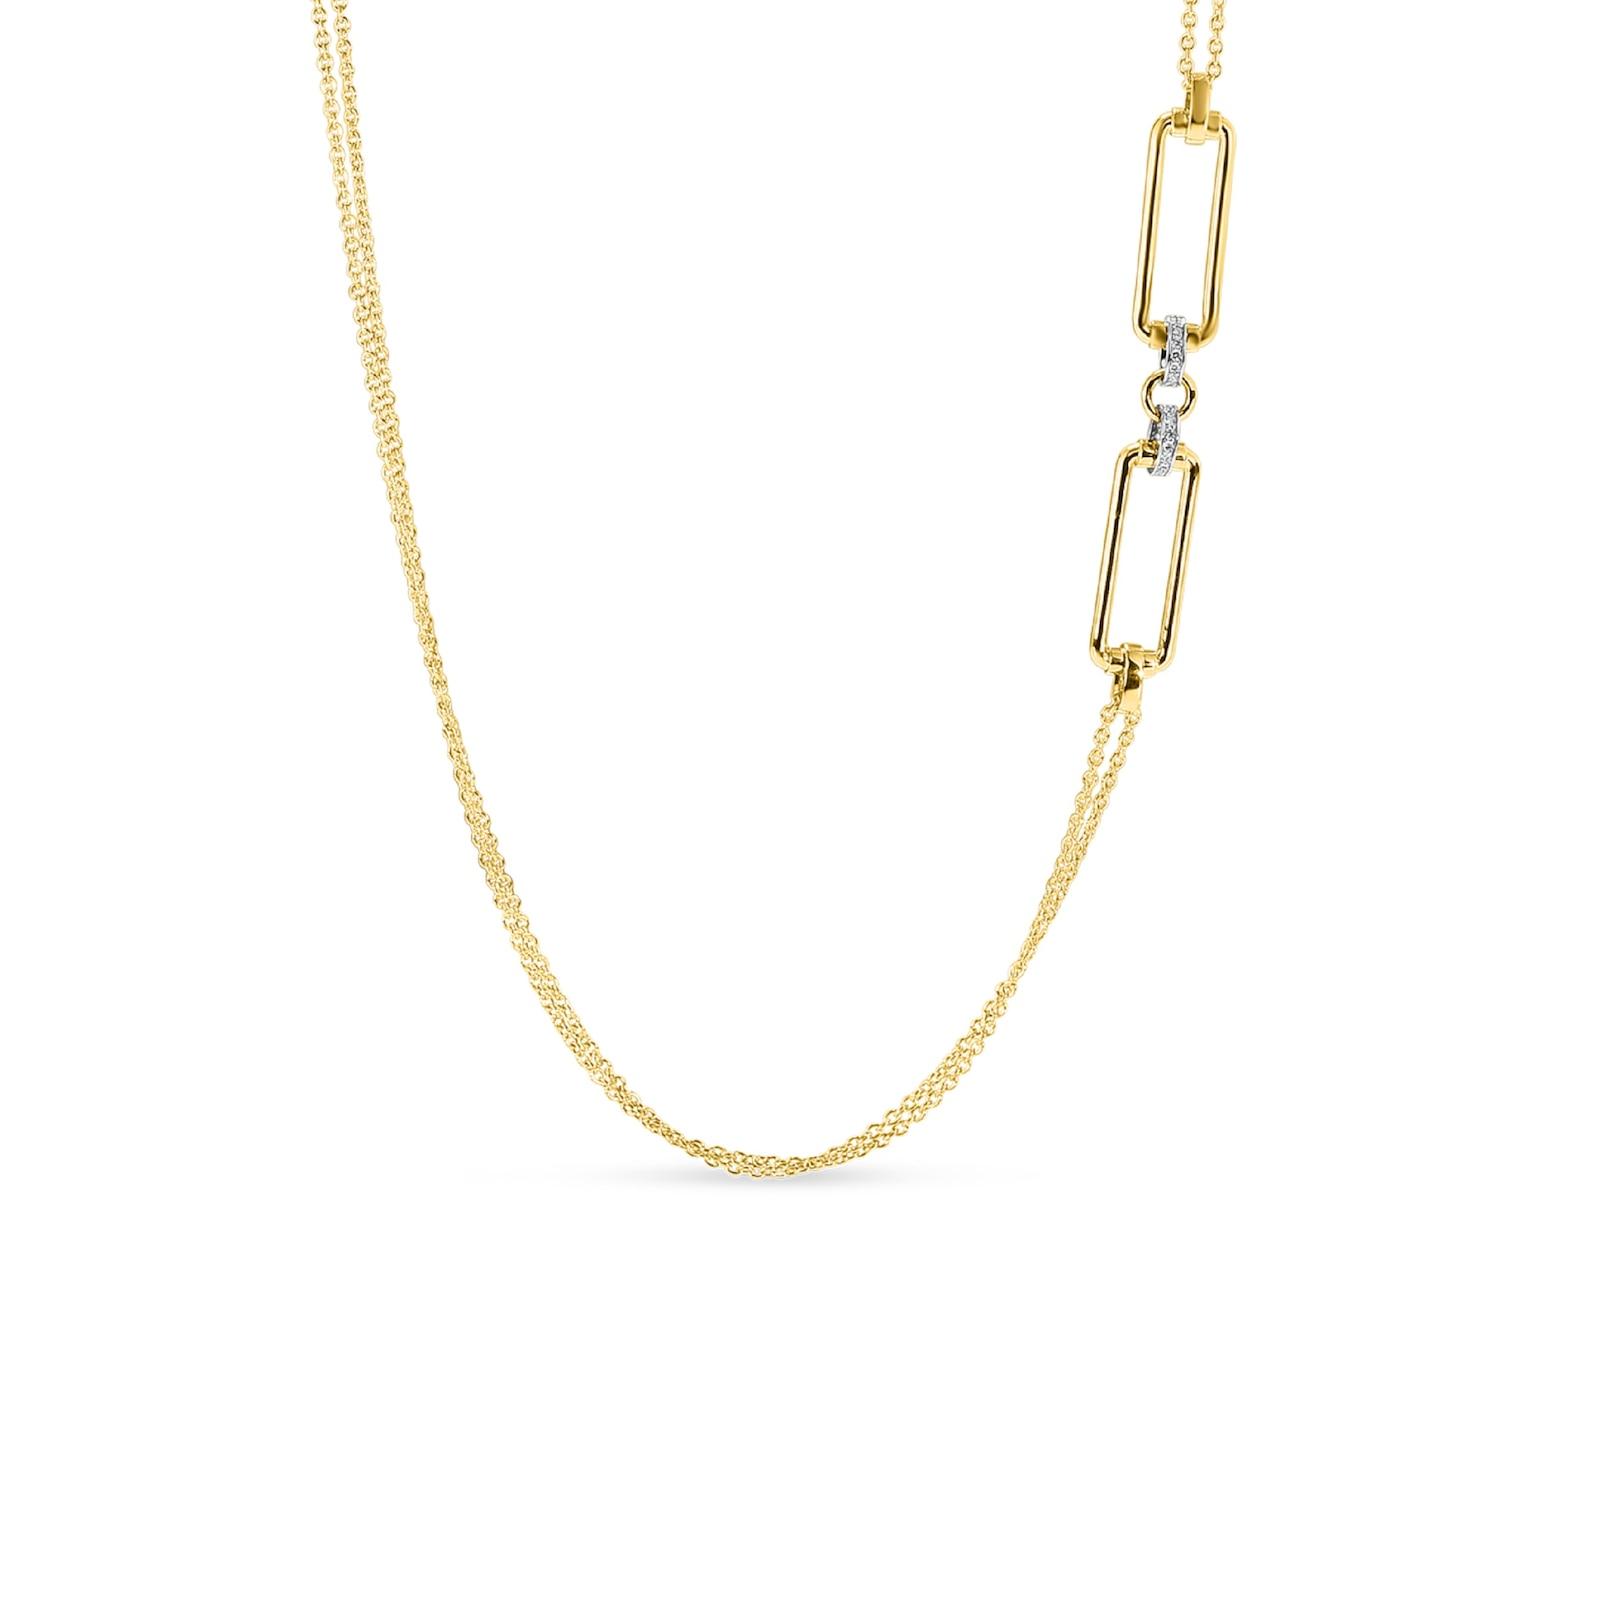 Roberto Coin Classique Parisienne Diamond Necklace